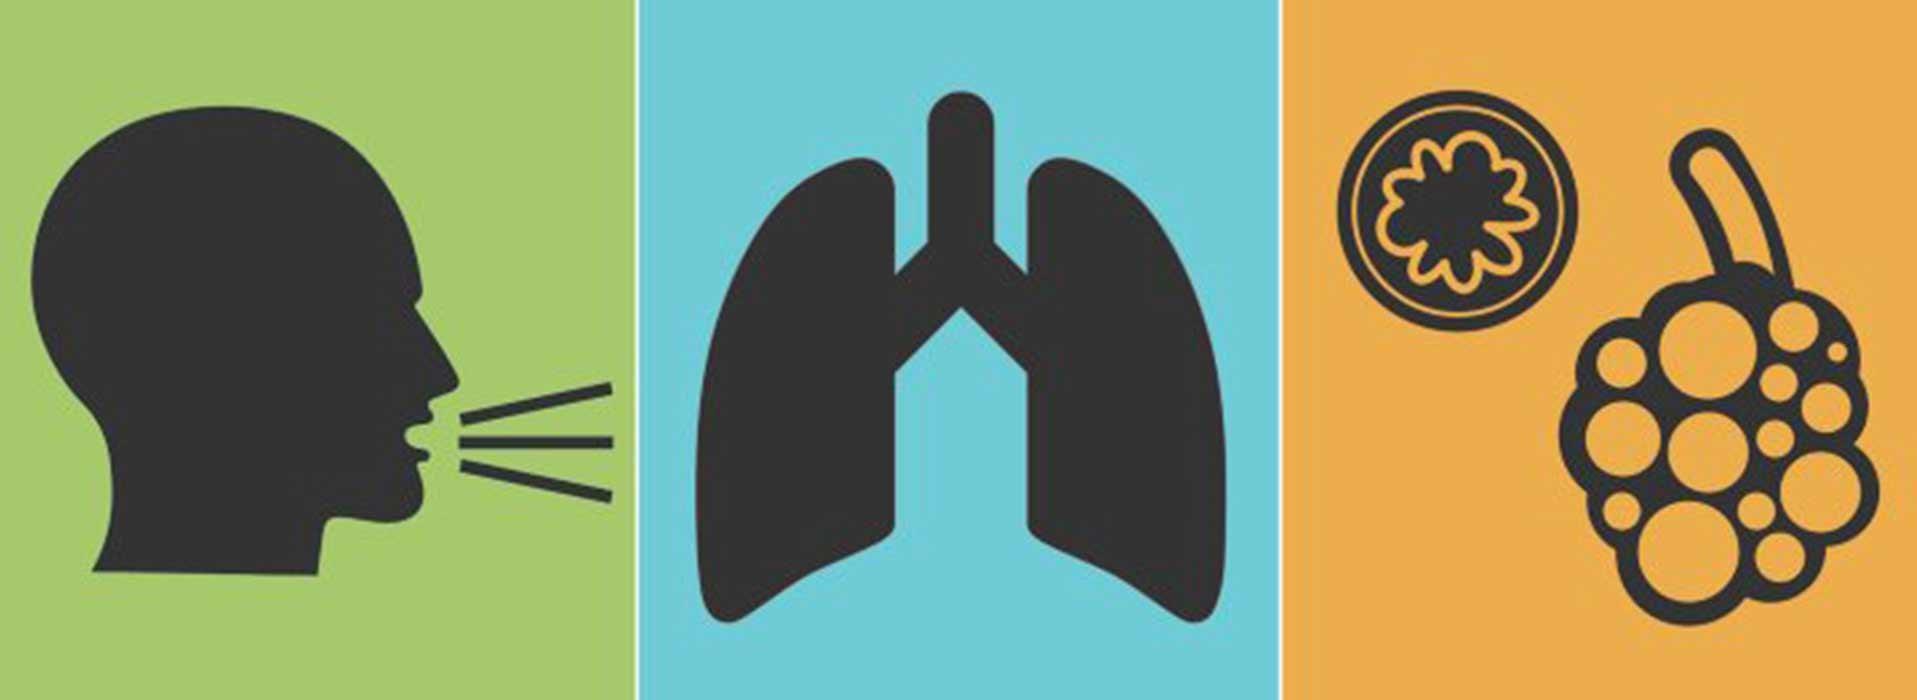 COPD bronchitis longemfyseem